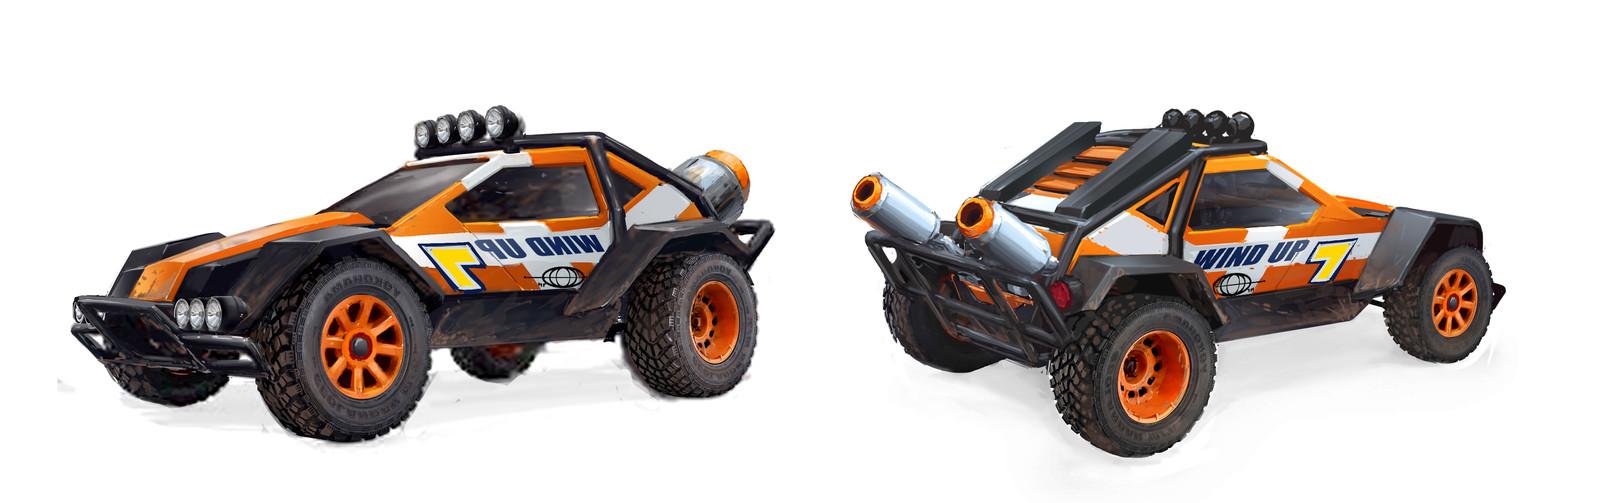 CastAR Racer Vehicle Concepts